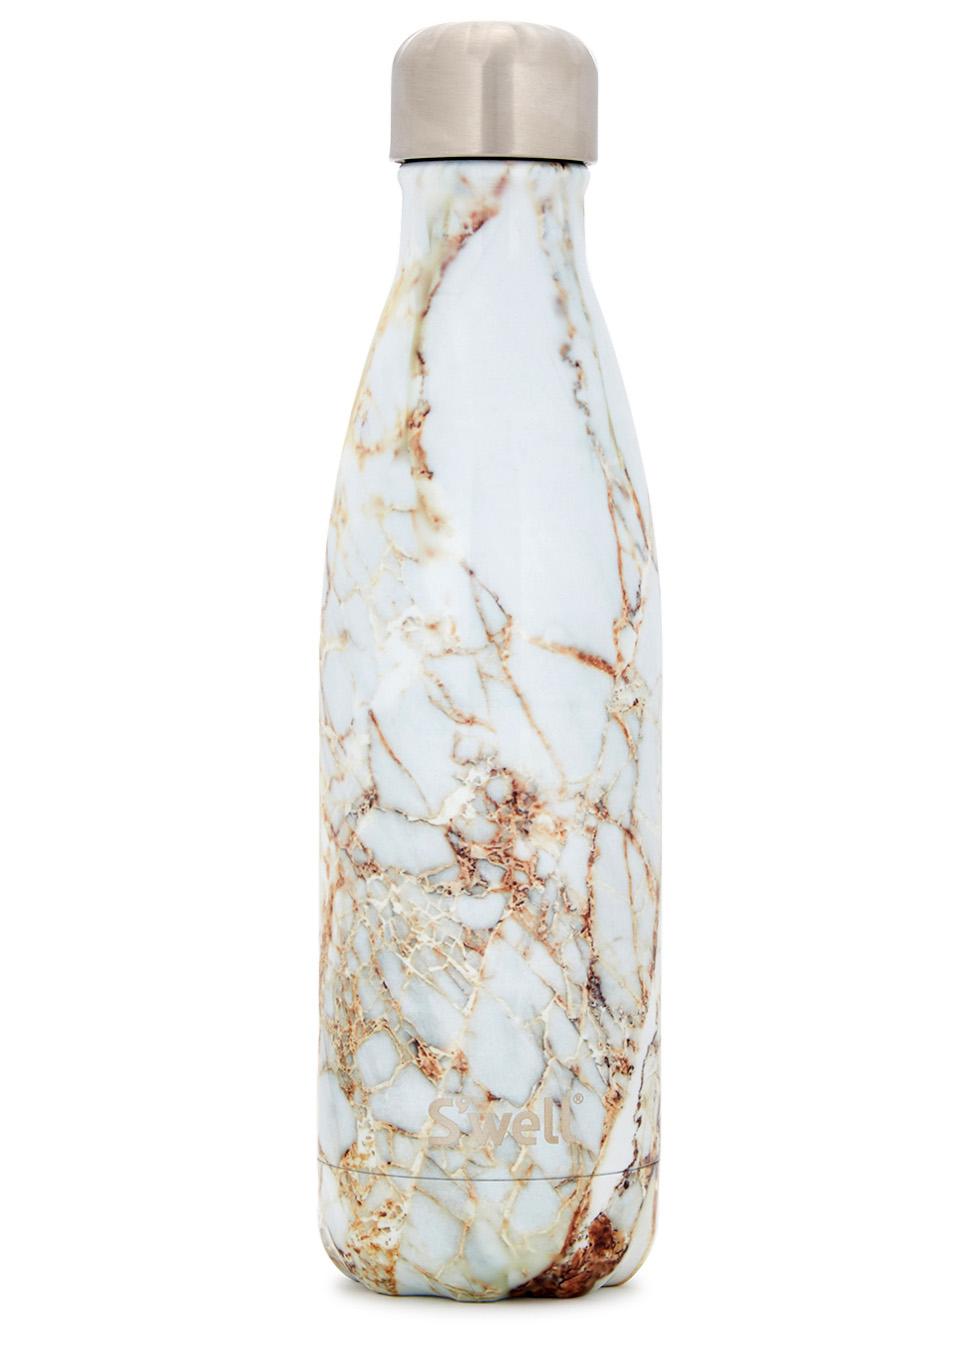 Calacatta Marble stainless steel bottle 500ml